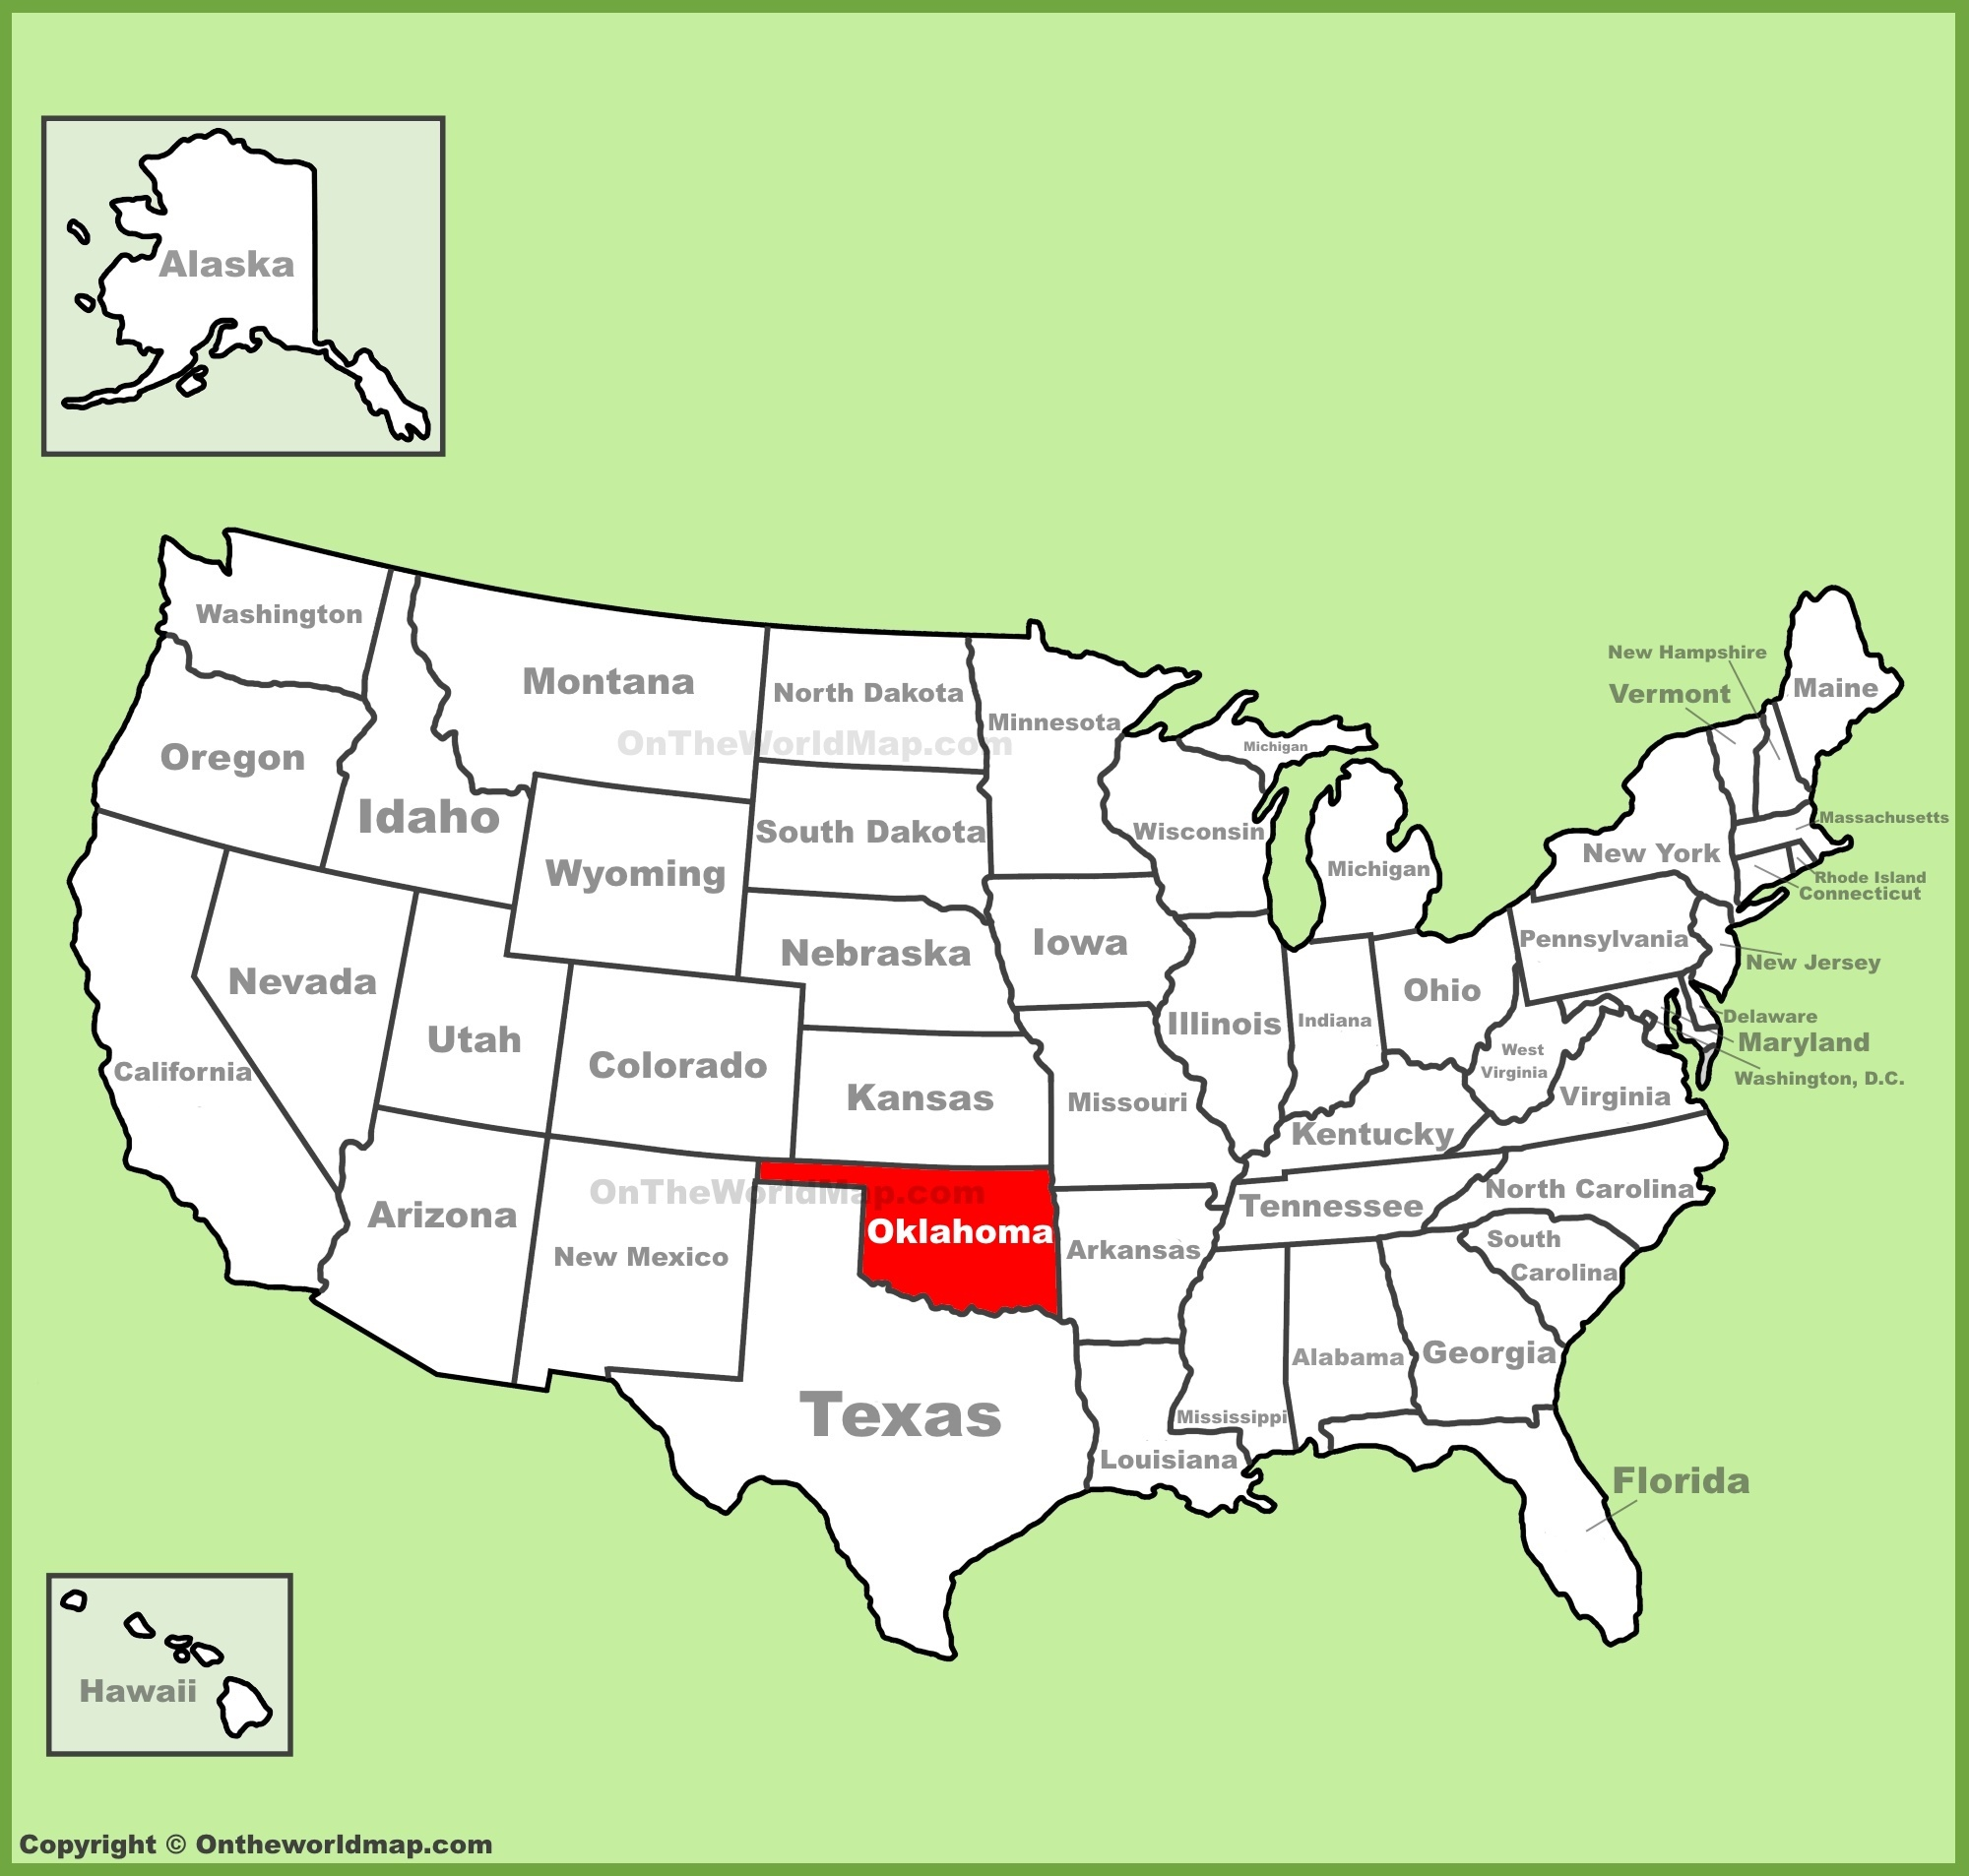 Oklahoma On Map Oklahoma location on the U.S. Map